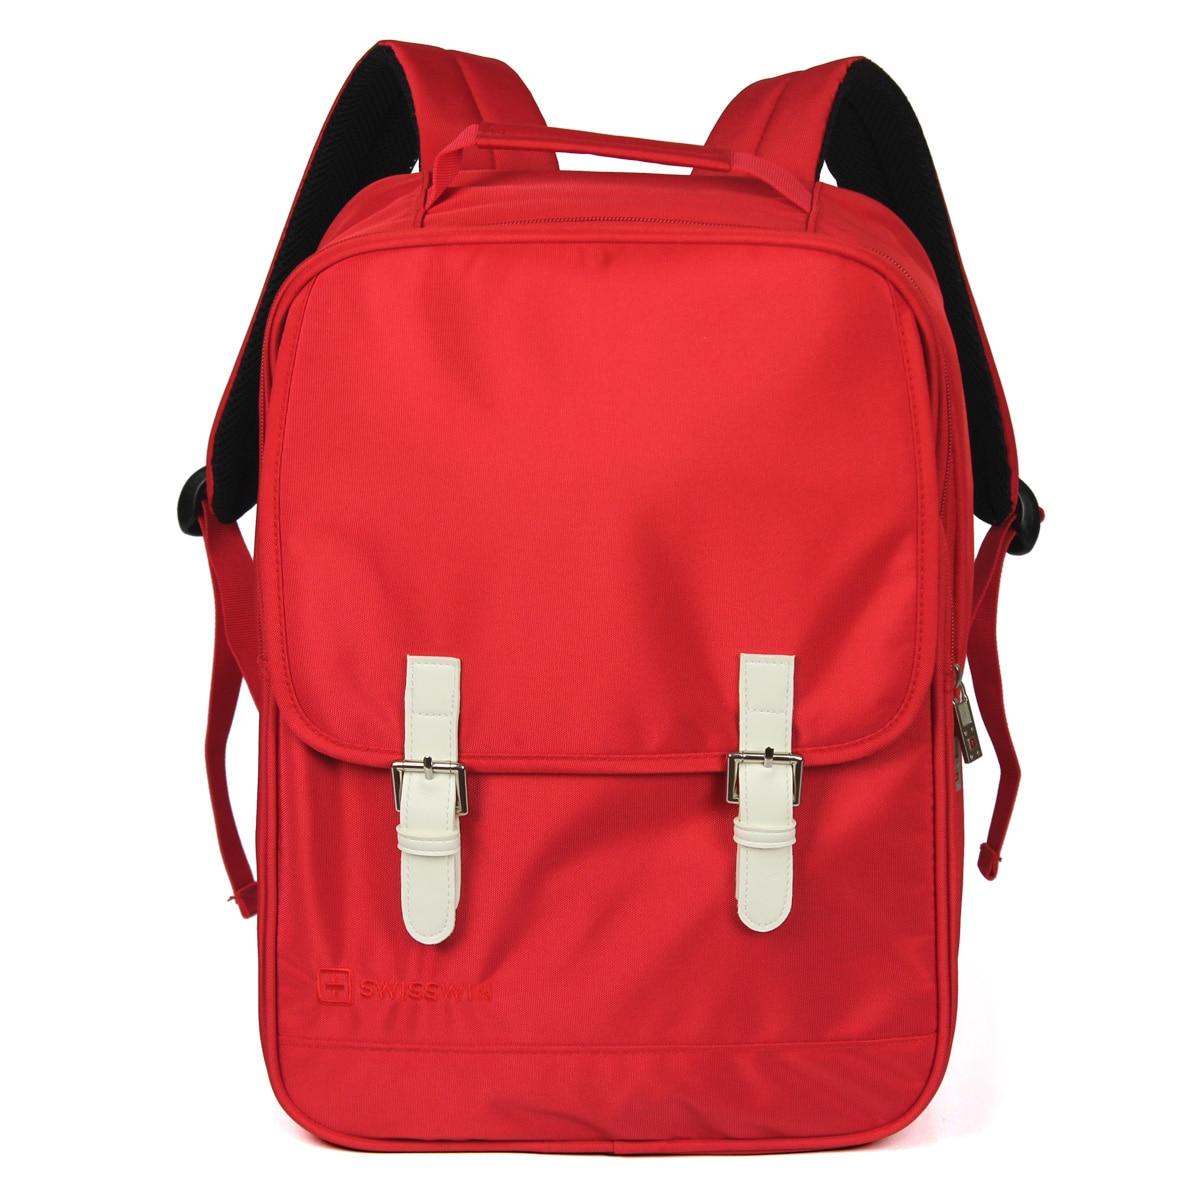 High Quality Swisswin Backpack For Student Fashion Men Women Large Capacity Rucksack 14 Laptop Backpack Mochila Escolar SWK2004